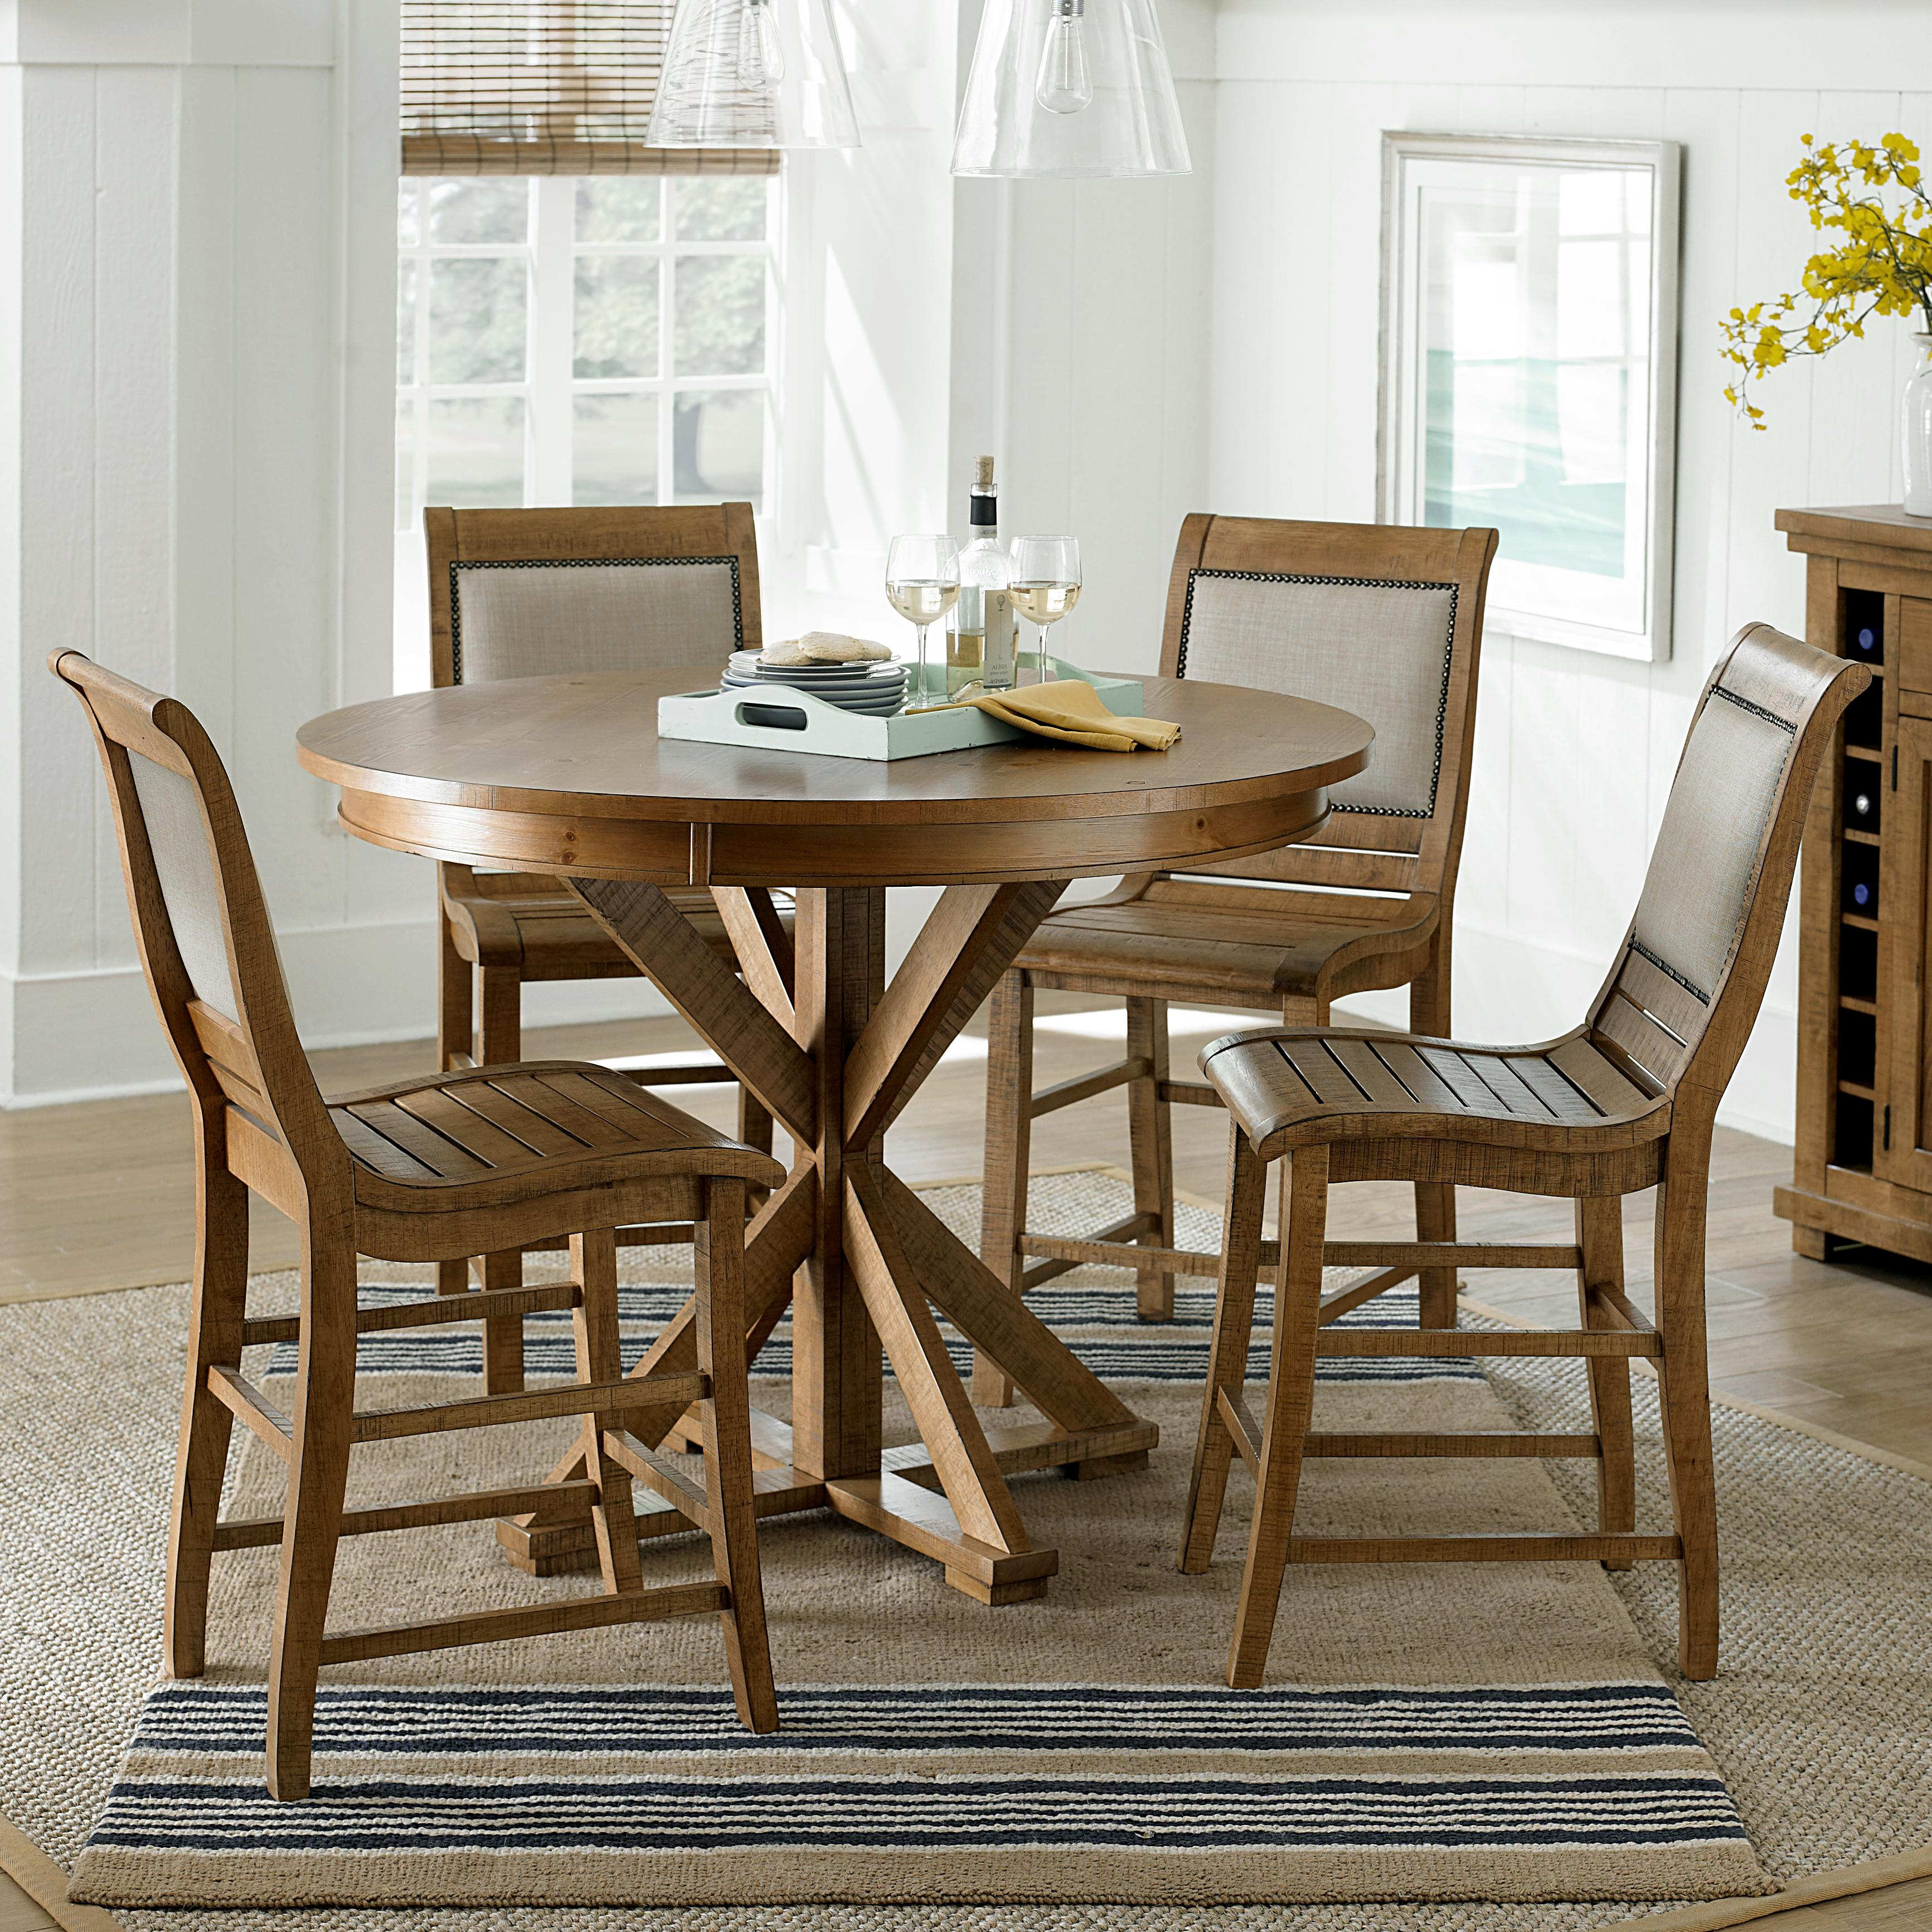 progressive furniture willow dining 5piece round counter